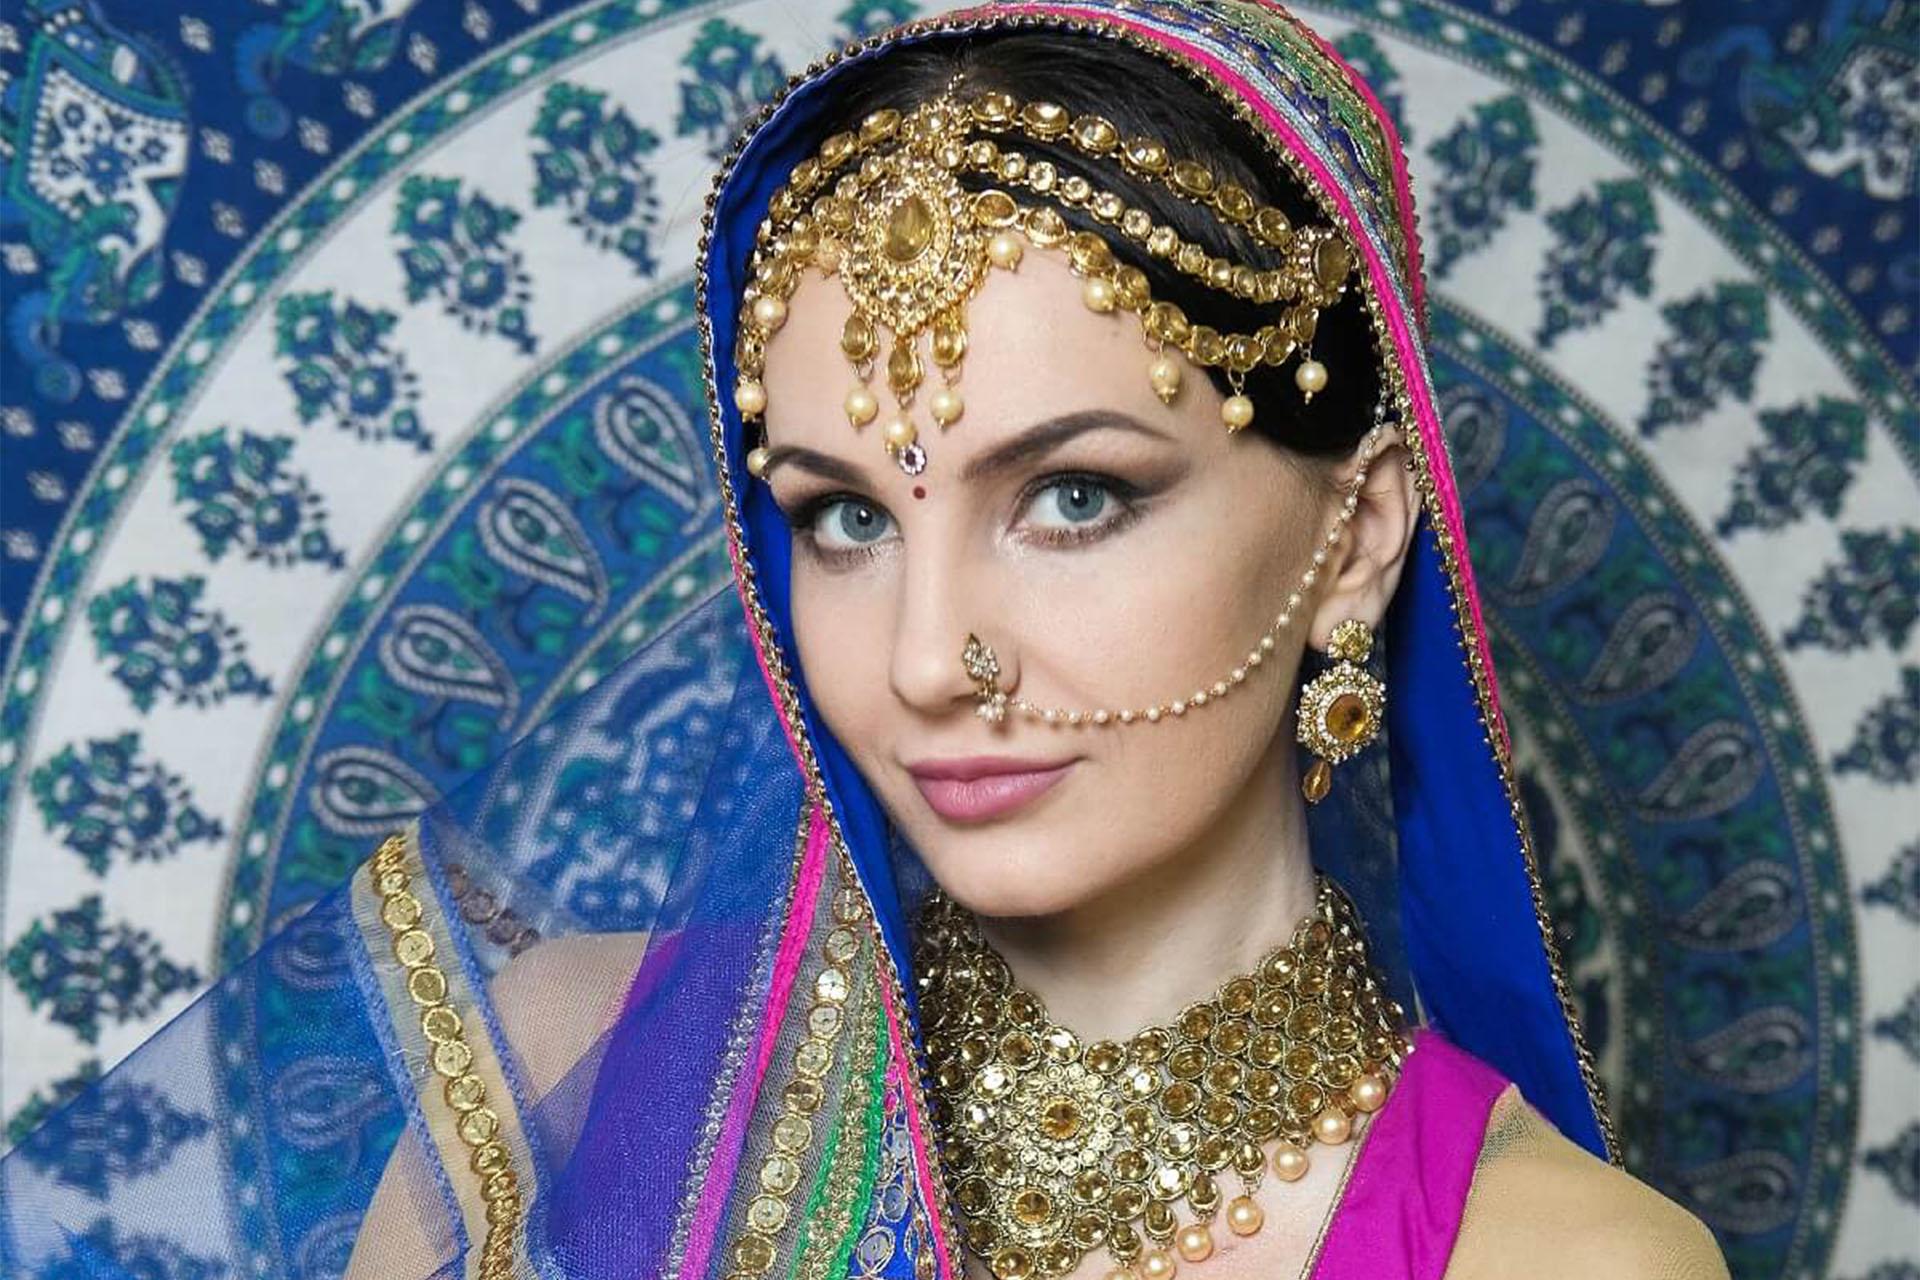 Indian Bridal Makeup Looks to Rock the Wedding Season